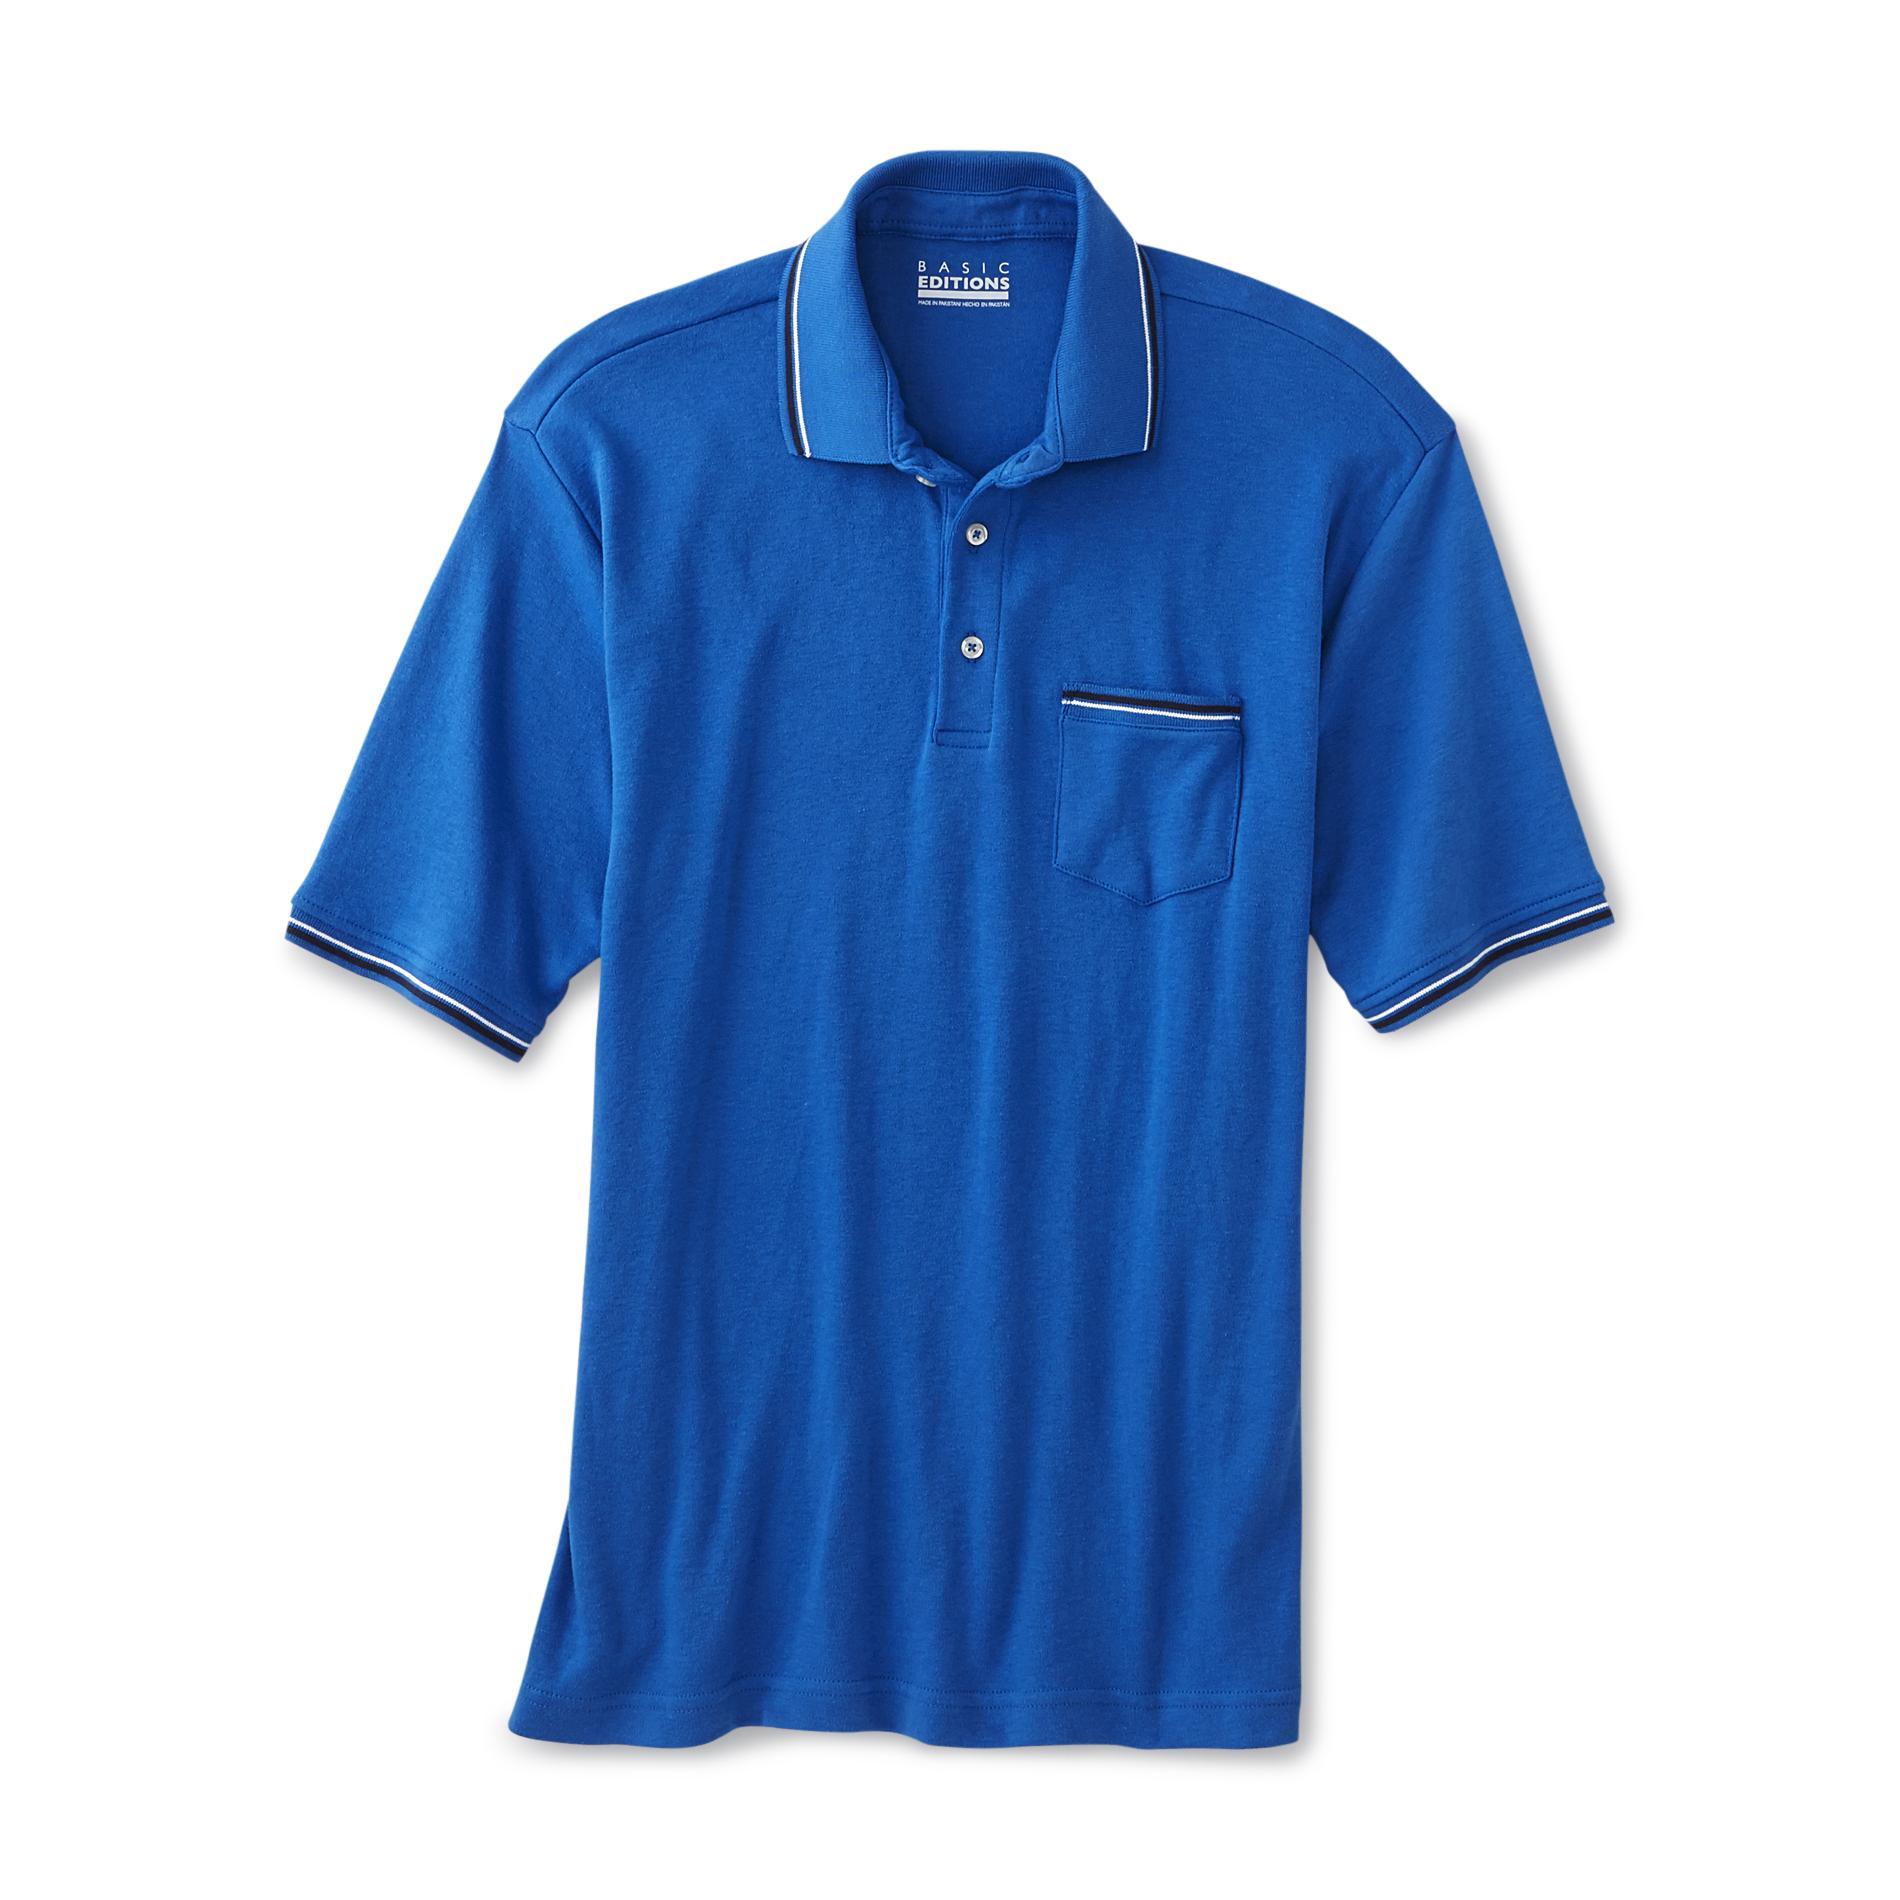 Top Buy Ralph Lauren Shirt Polo Polo Black Short-Sleeve Slim-Fit Men Where To Buy It,Men Ralph Lauren Where To Buy It.